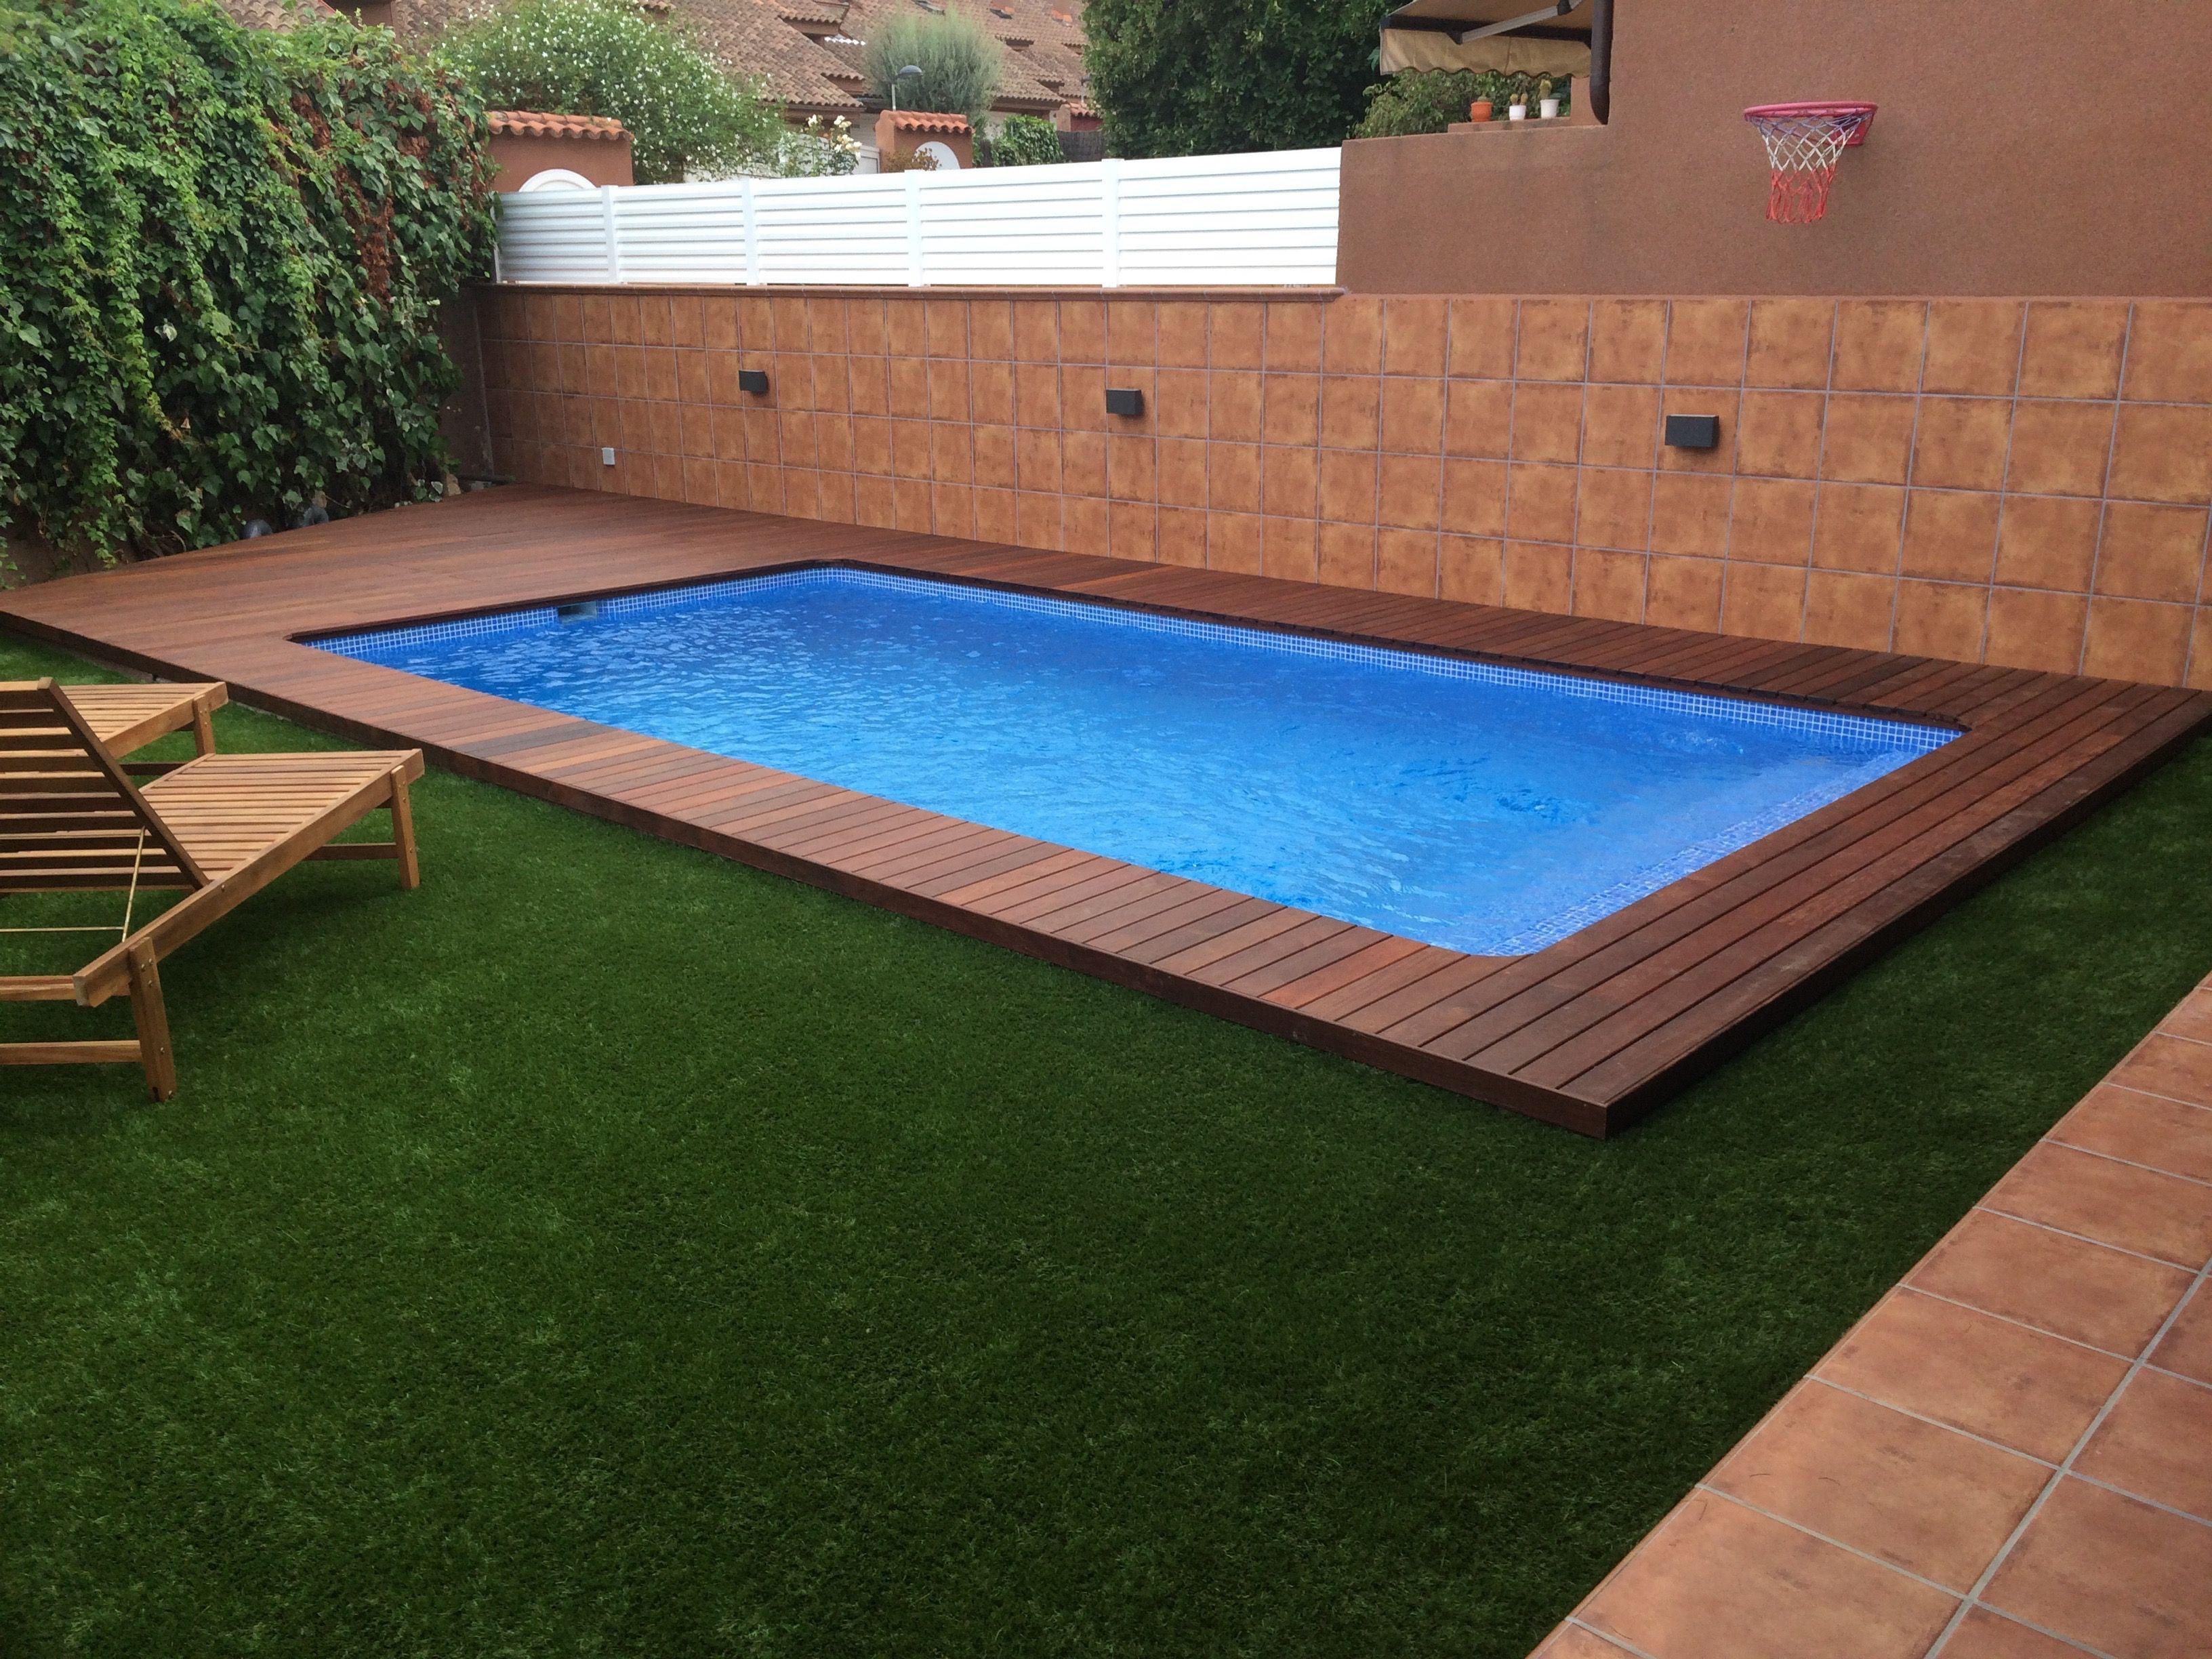 Dise o piscina madera elevada casa dise o for Cuanto sale hacer una pileta de material 2016